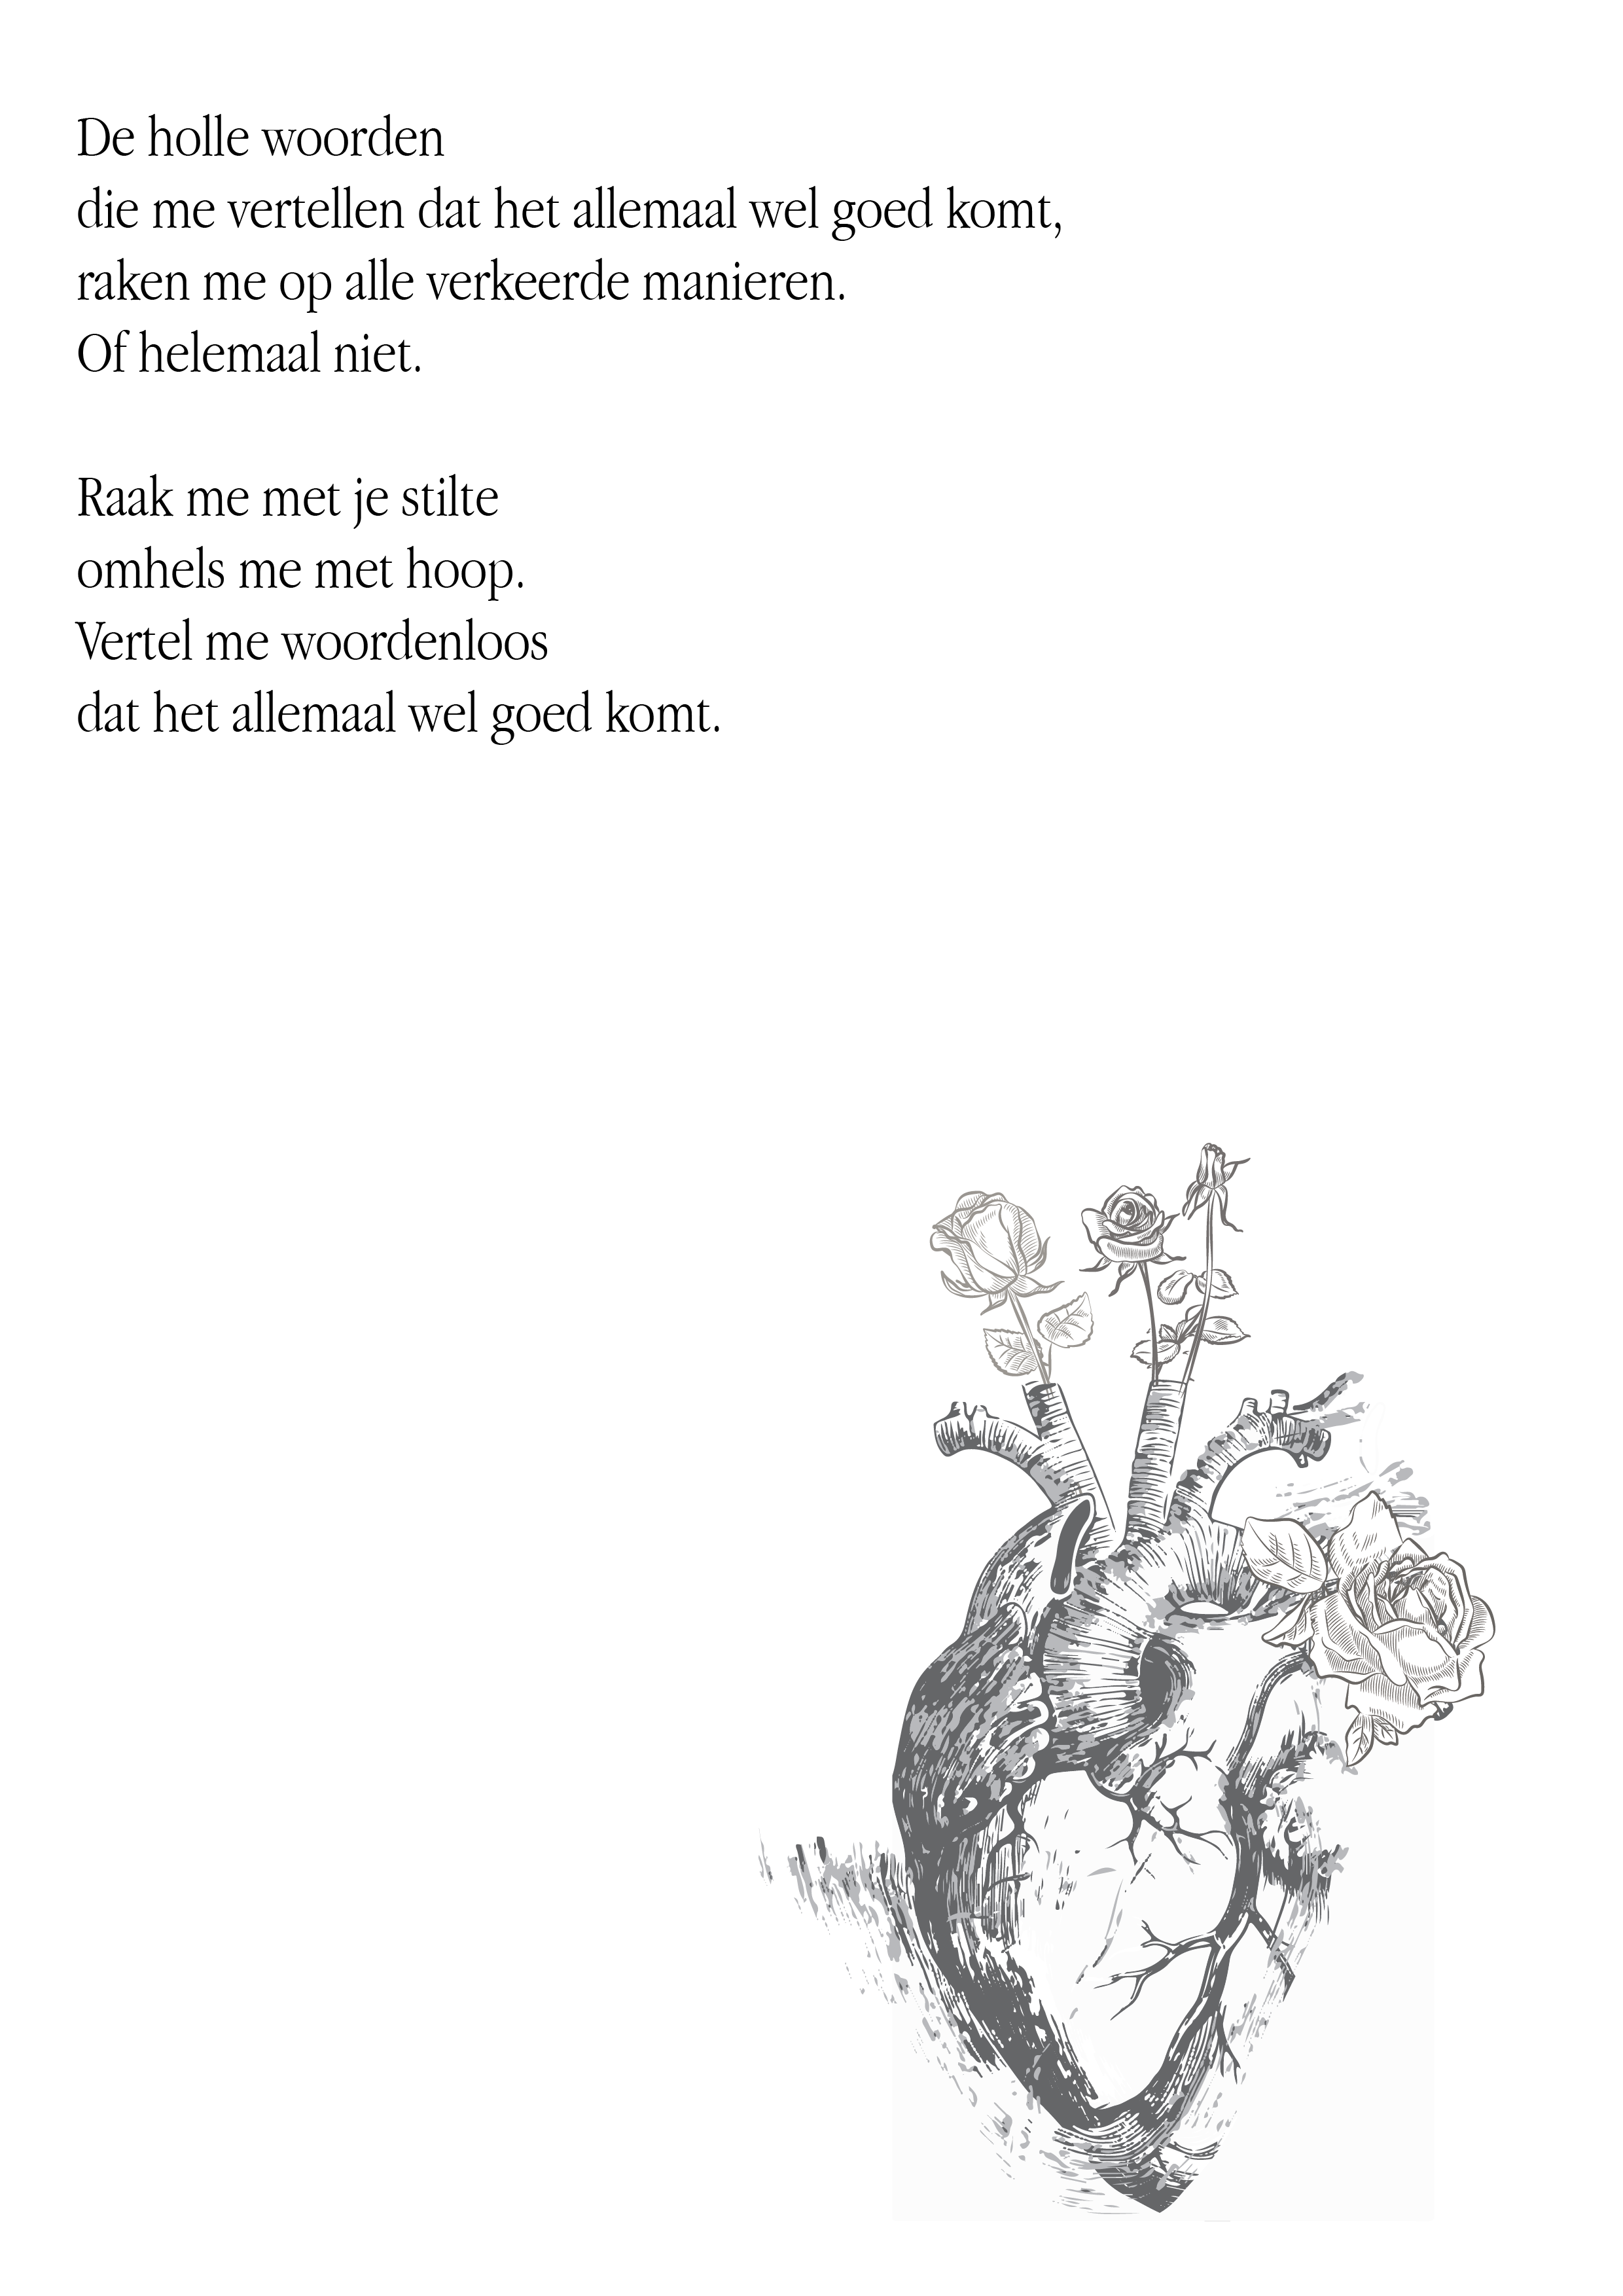 Poezie Nederlands Schrijven Gedicht Dichten Schrijfsel